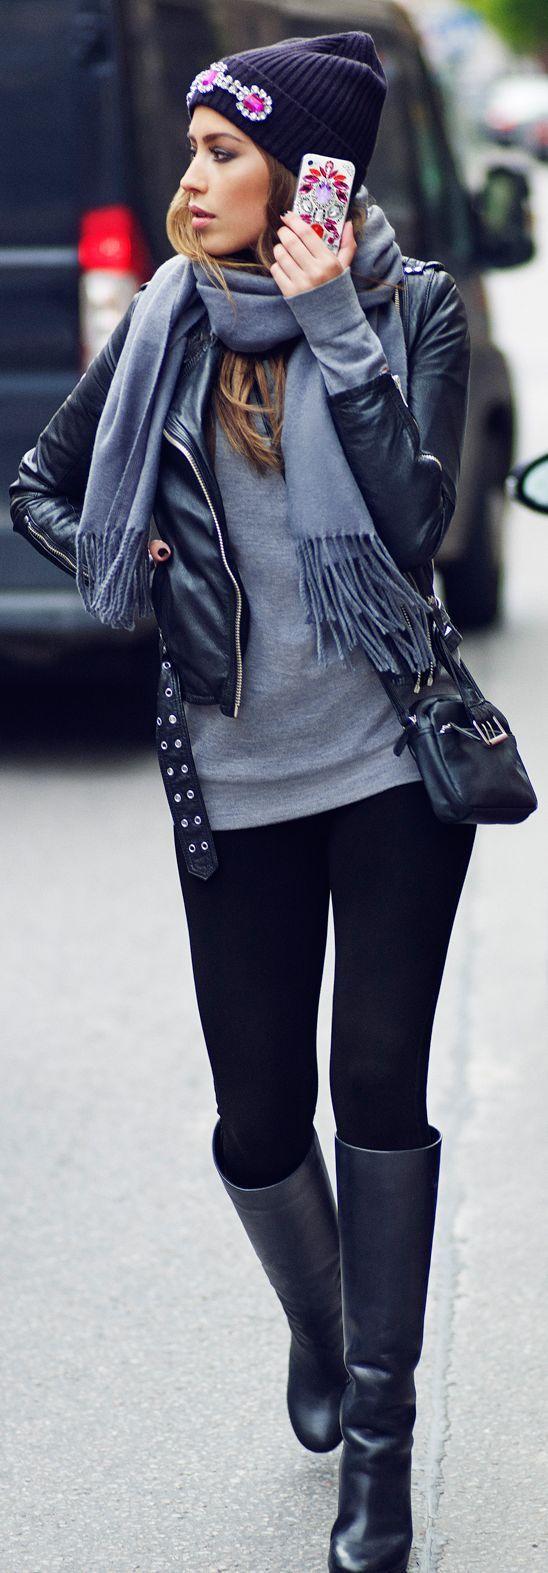 Grey-long-sleeve-shirt-and-black-leggings